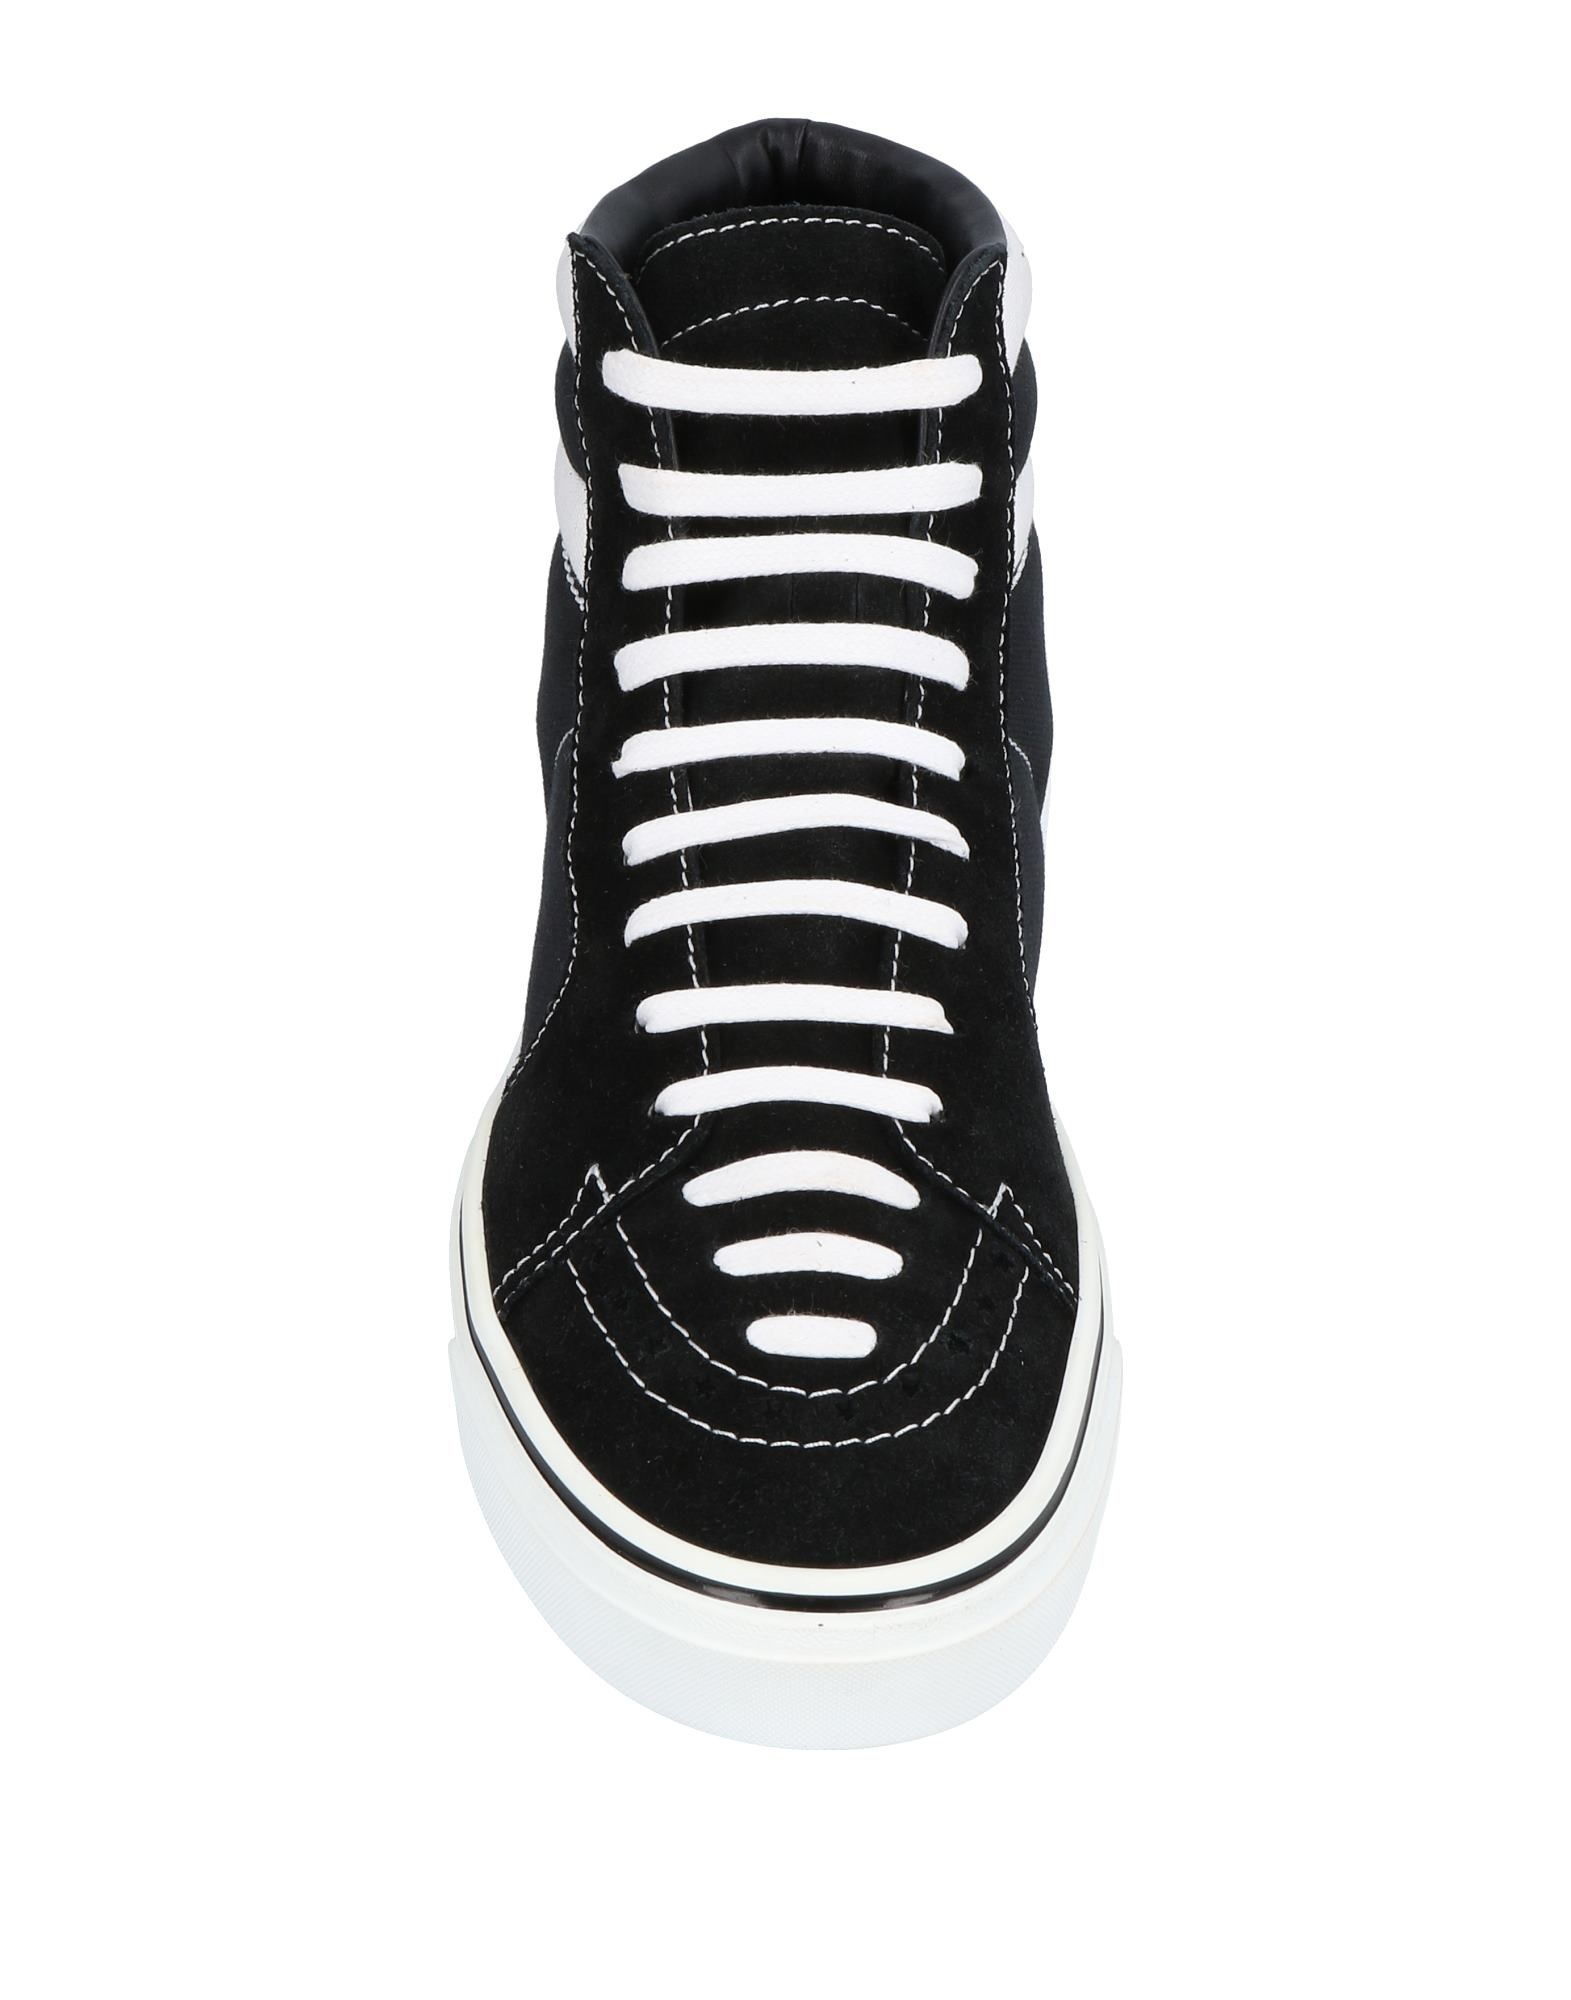 Givenchy Sneakers Herren  11465370RP Gute Qualität beliebte Schuhe